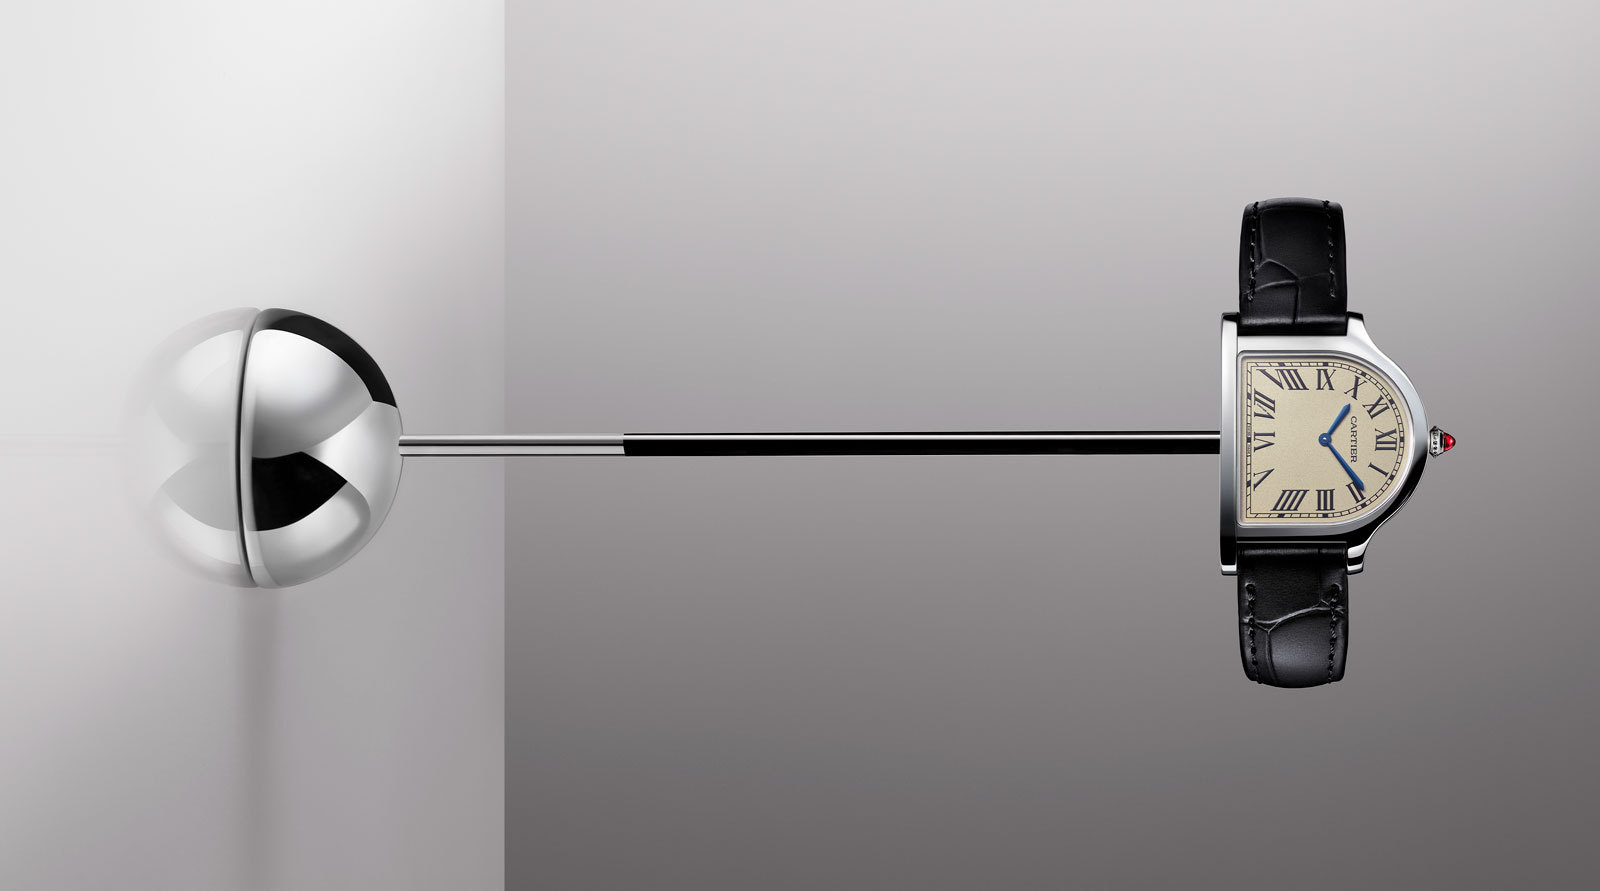 Cartiers new watch reworks the original 1920s bell design 1600x891